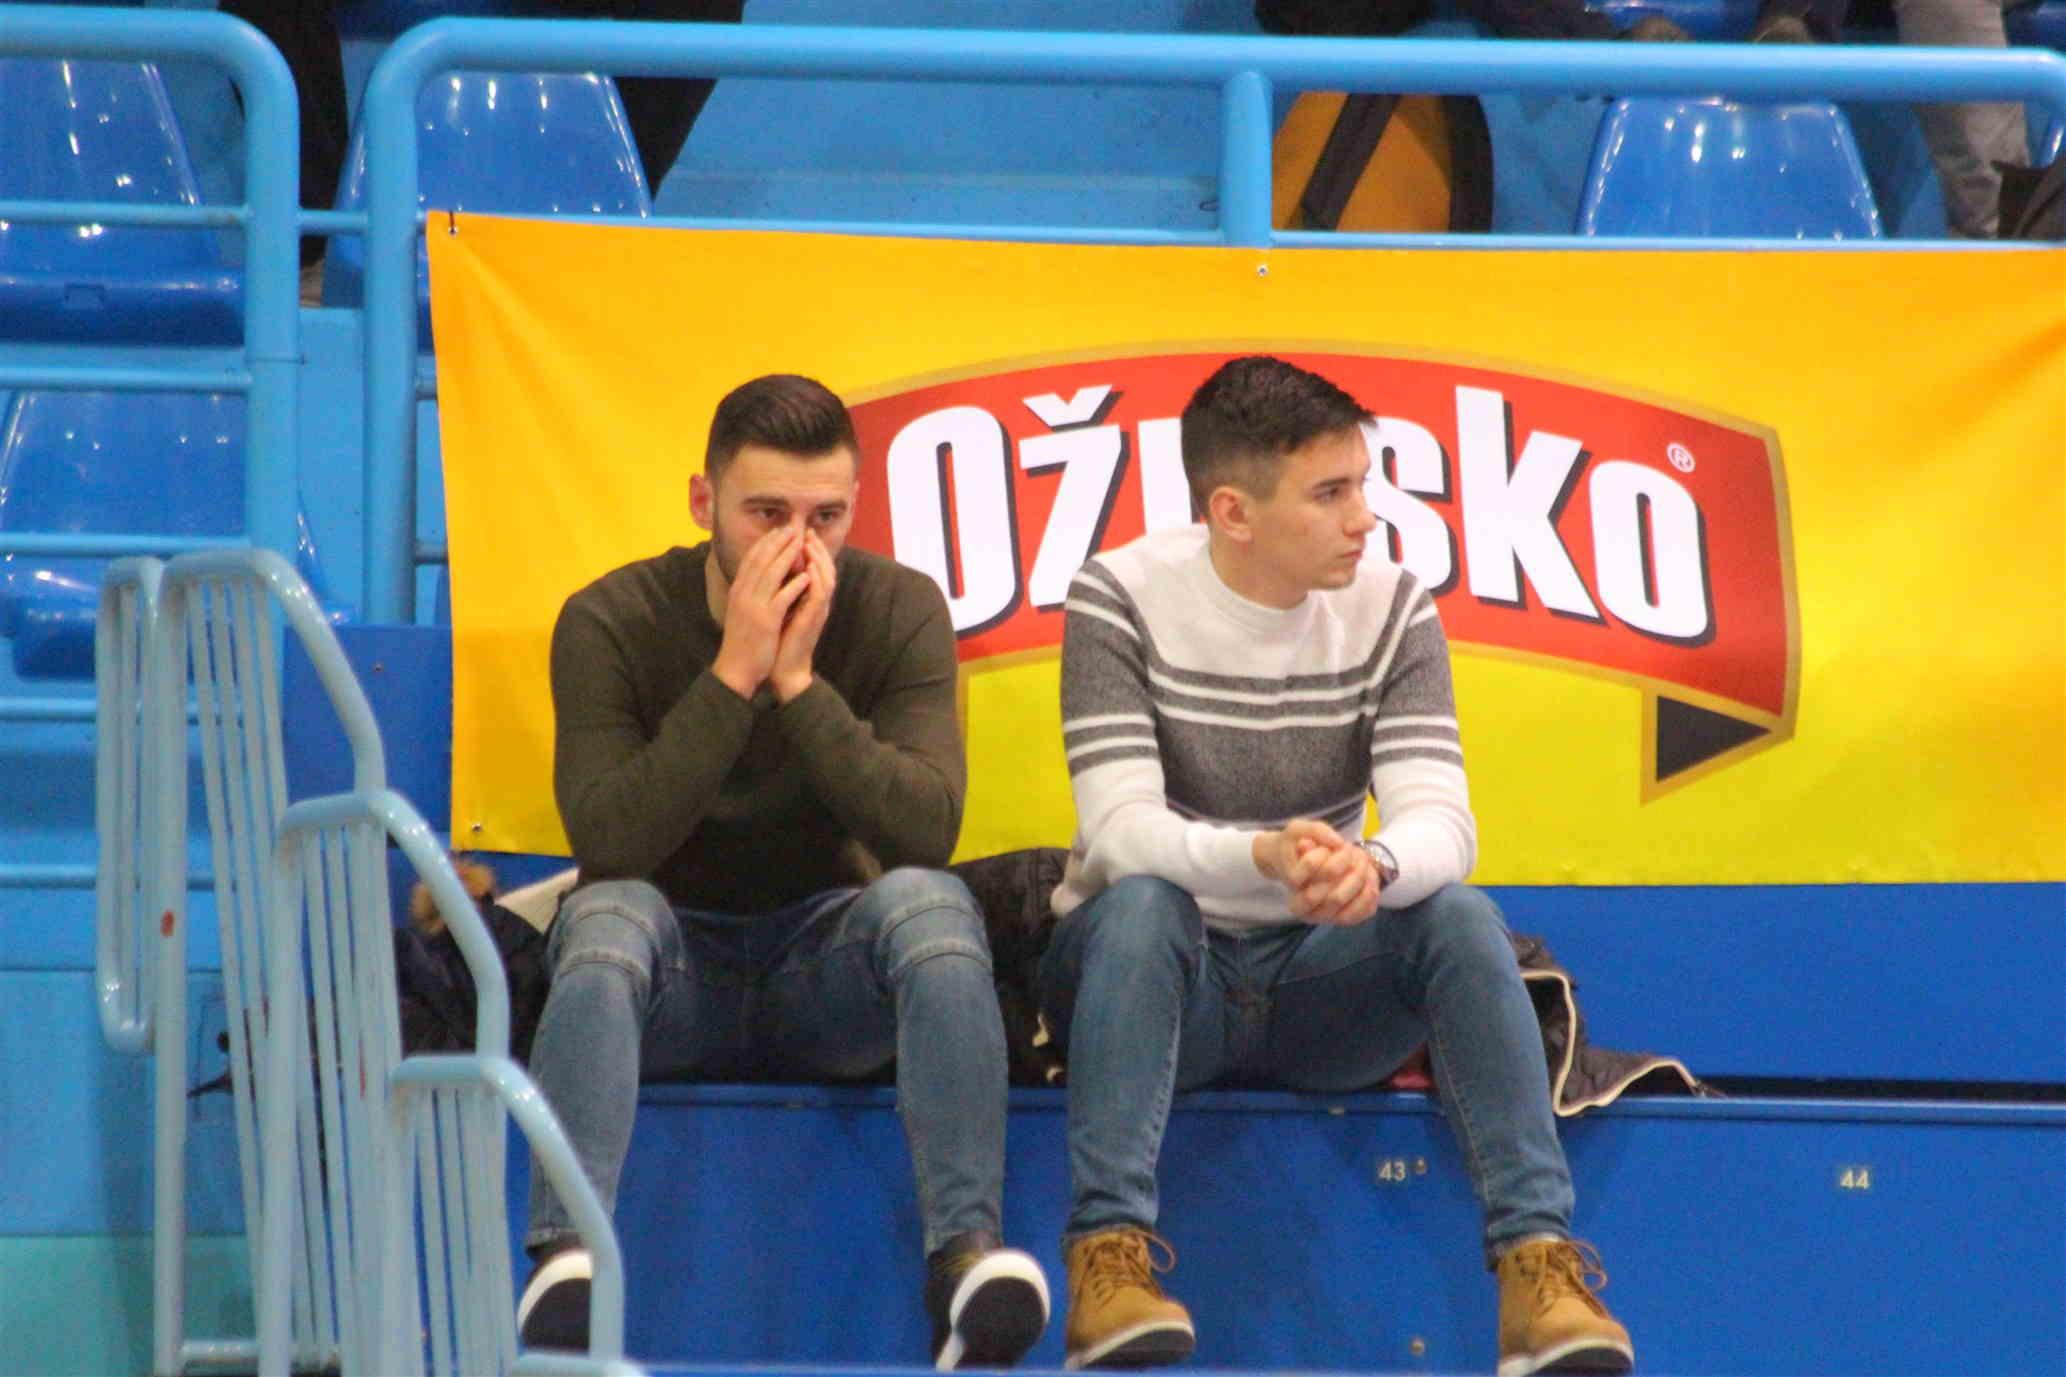 krizevci 2018 malonogometni turnir04